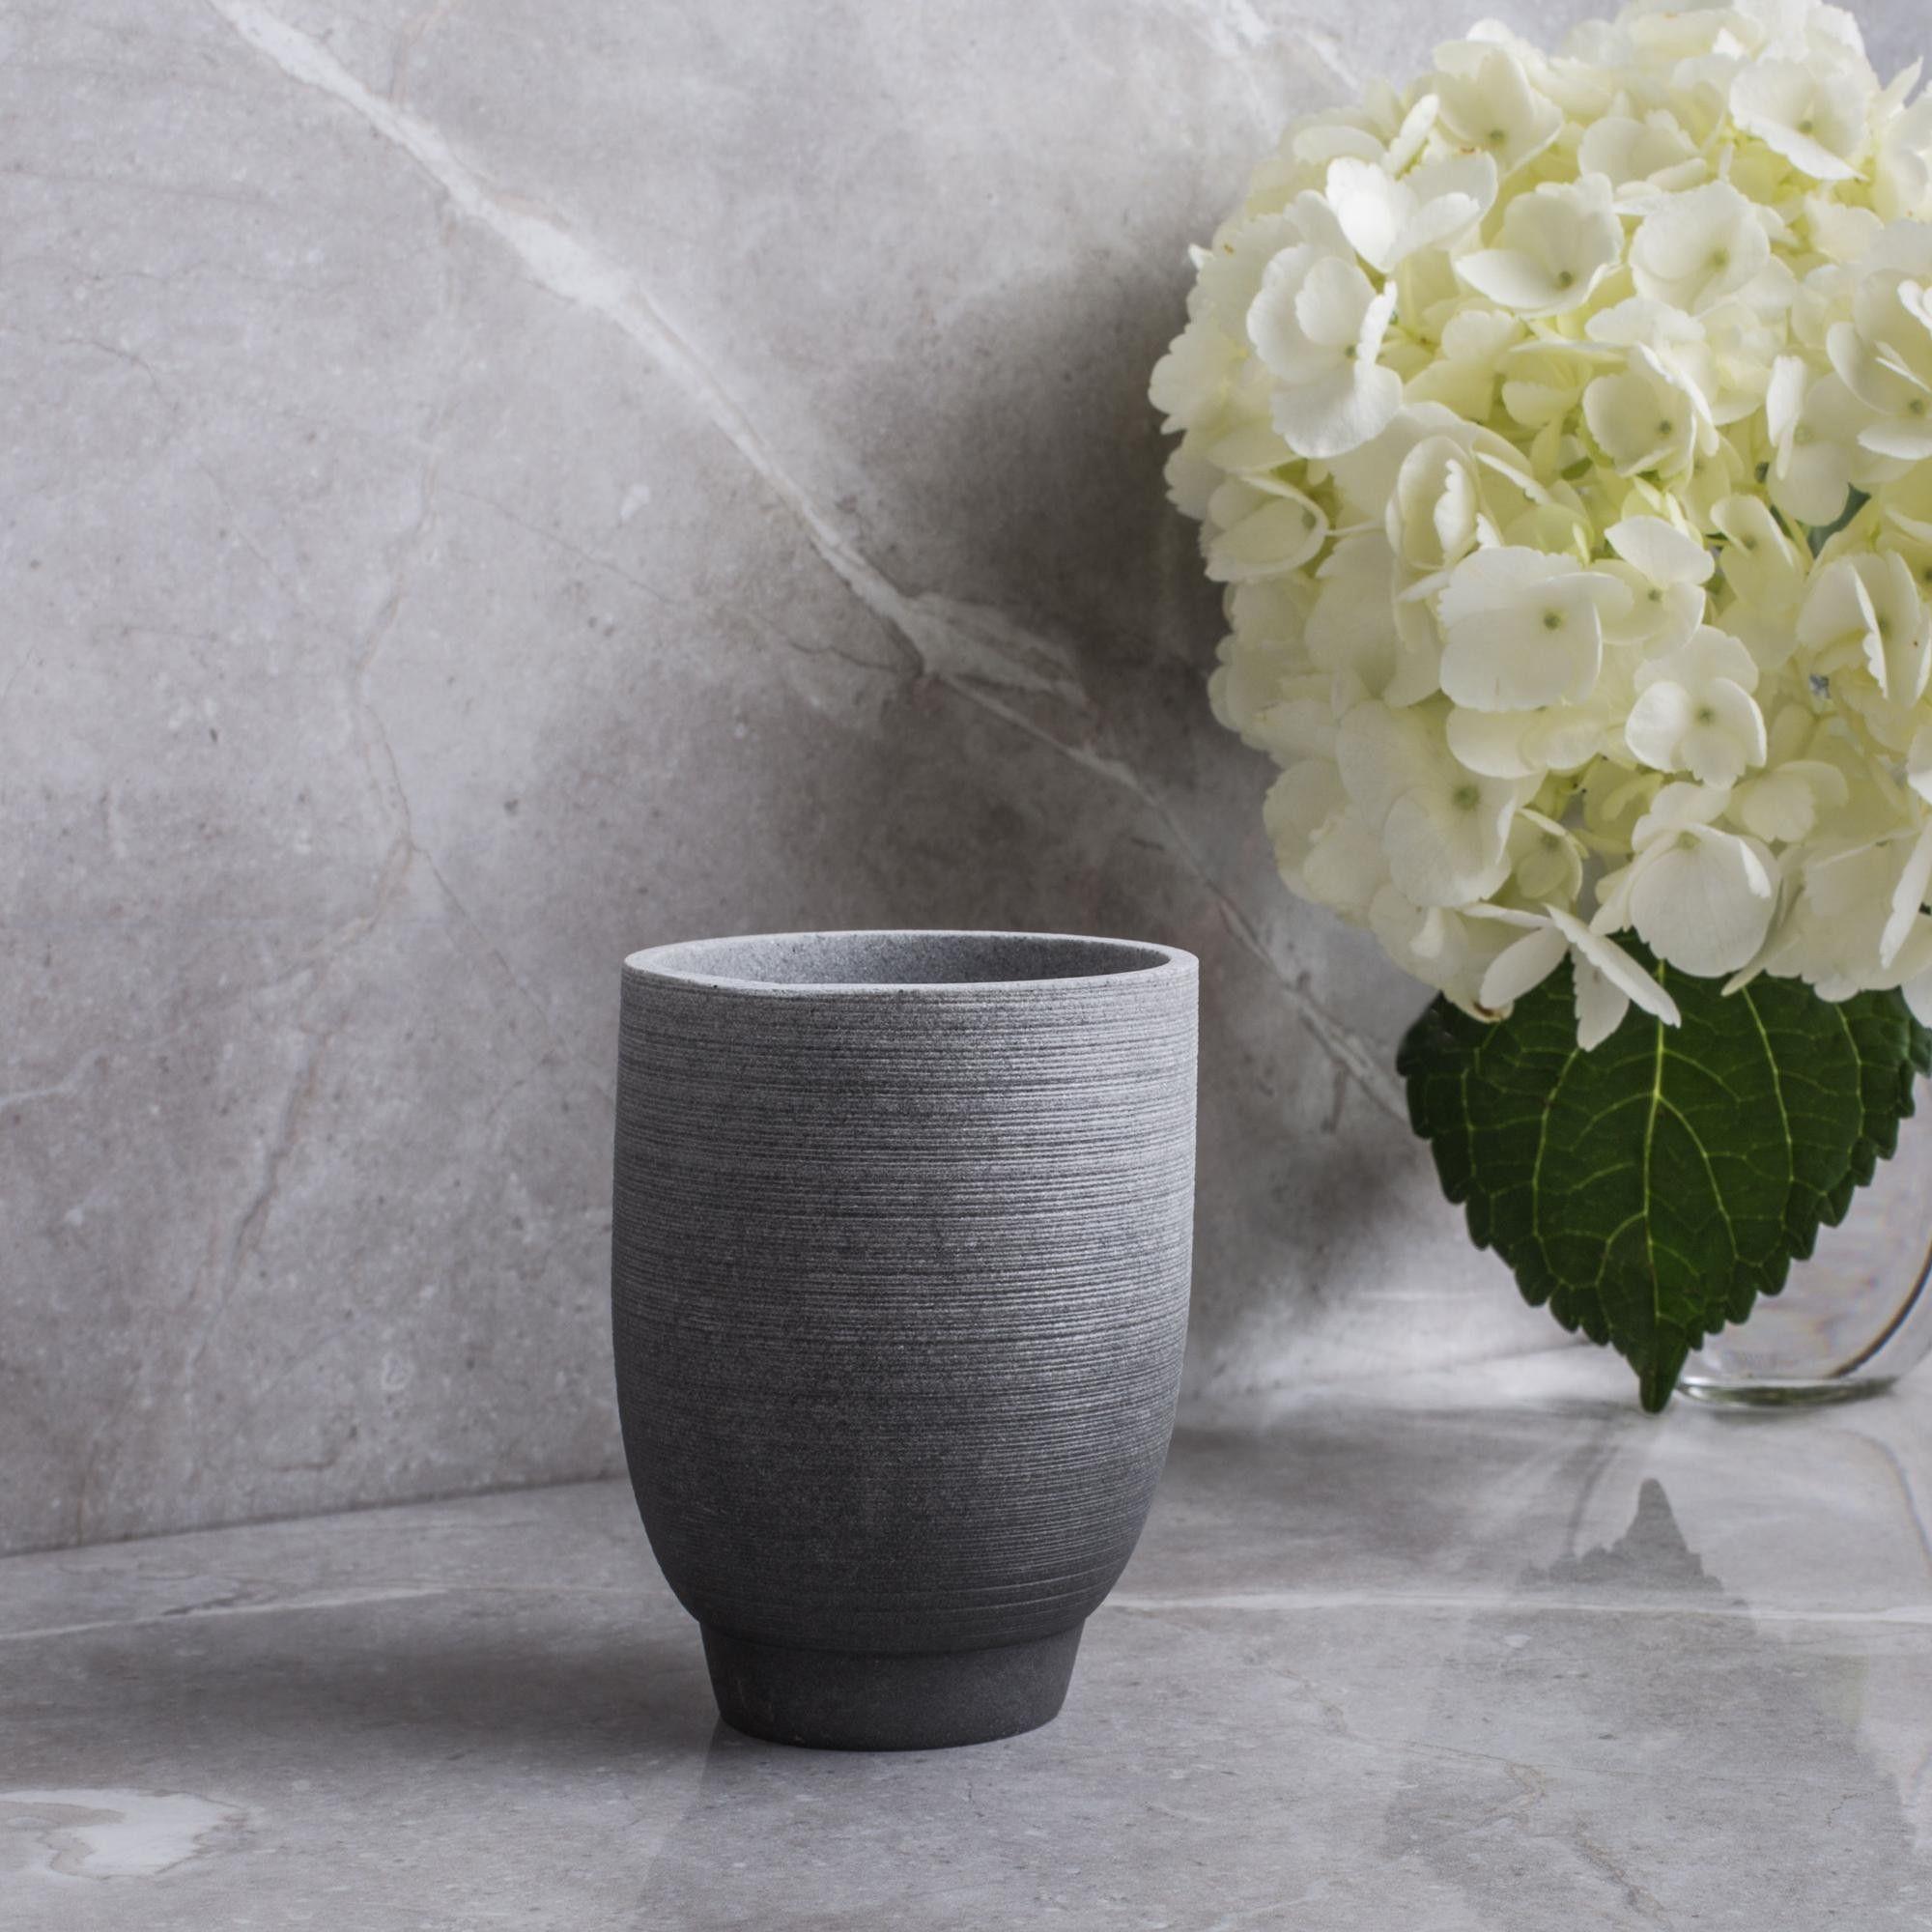 Moda At Home Greystone Resin Tumbler Grey Bathroom Accessories